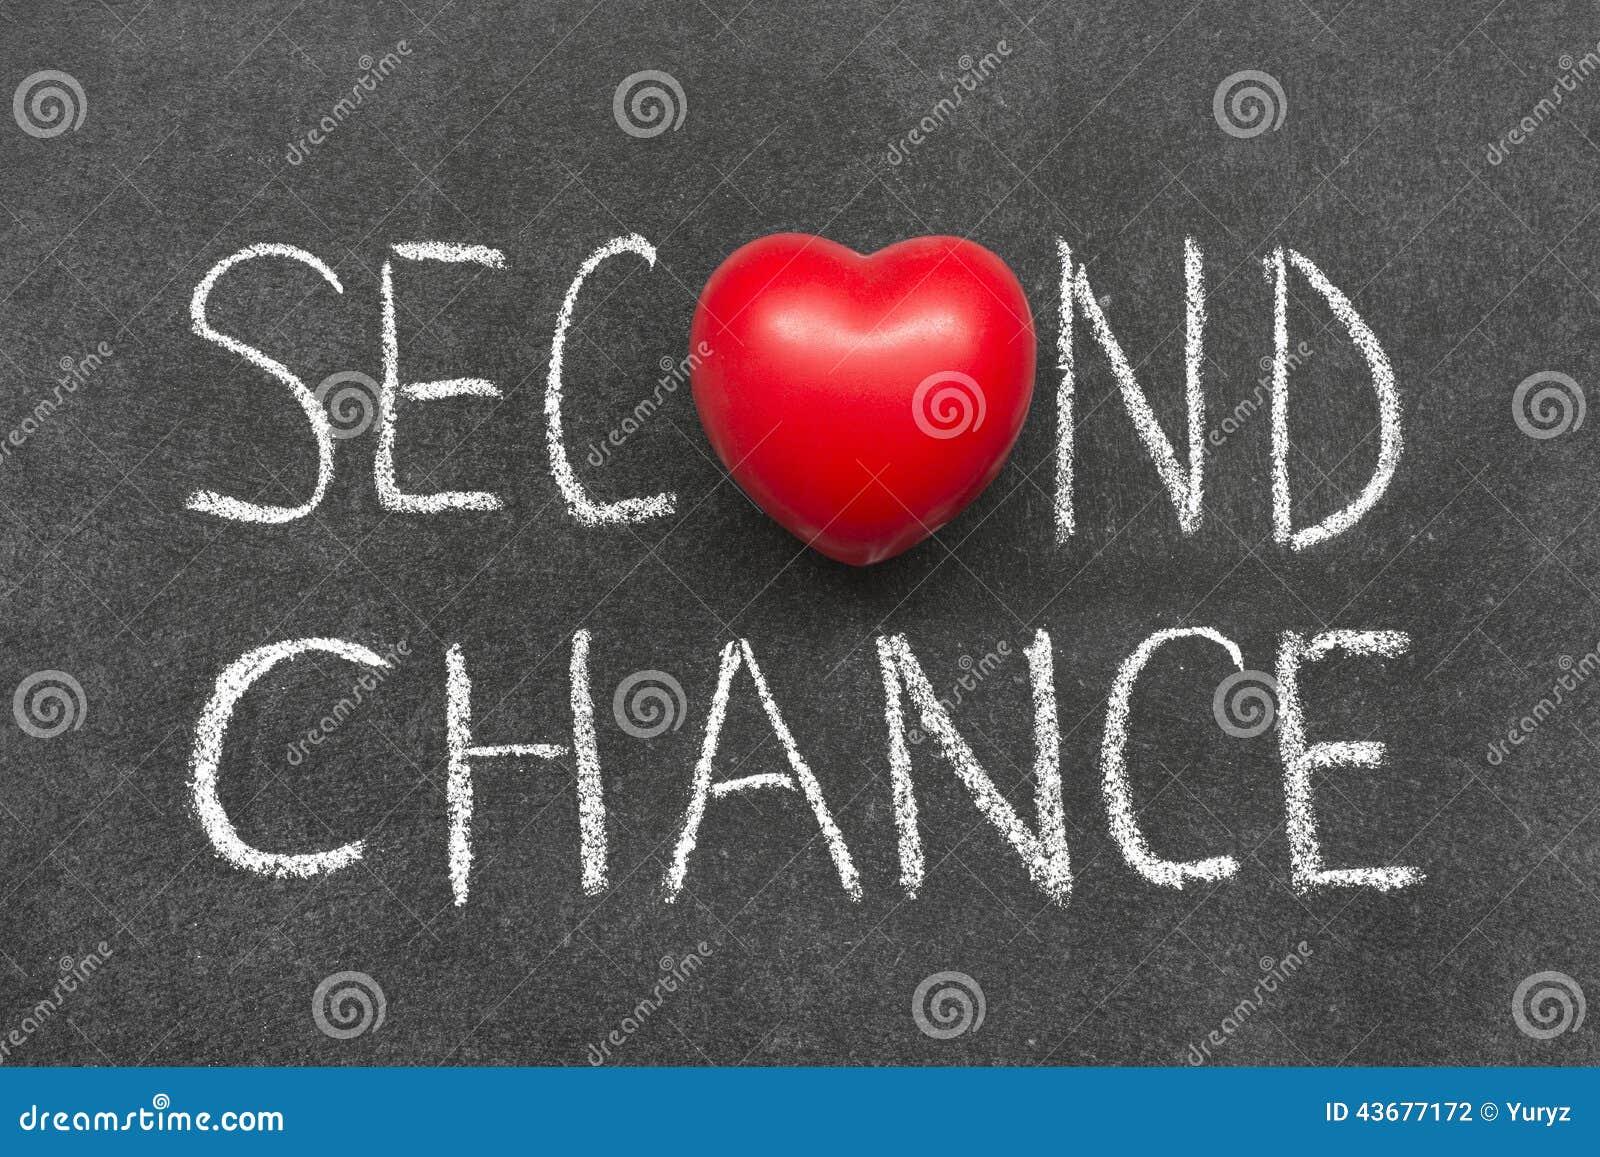 Second Chance Symbol